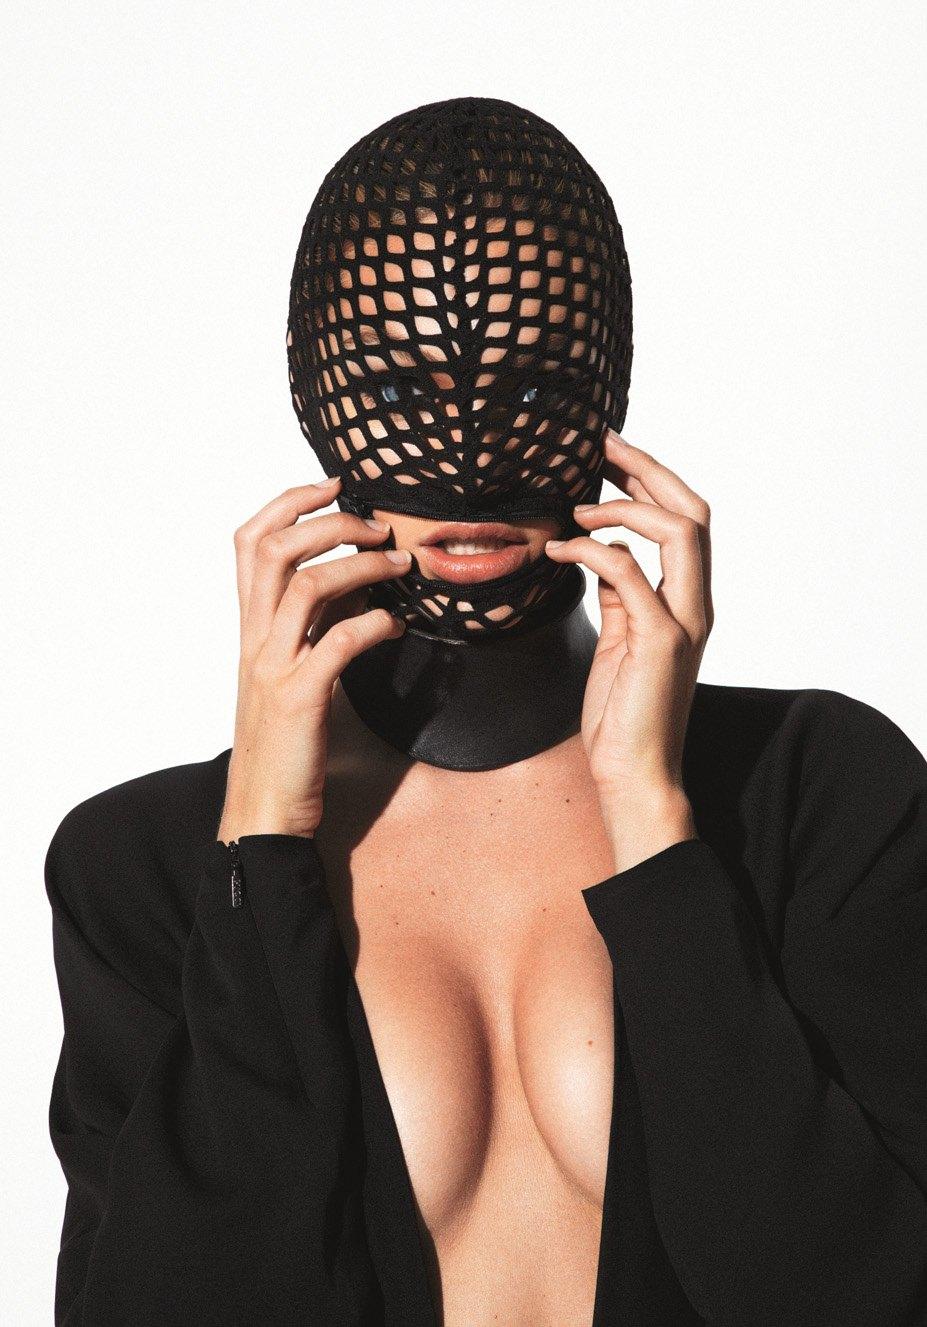 модель Кэндис Свейнпол / Candice Swanepoel, фотограф Collier Schorr